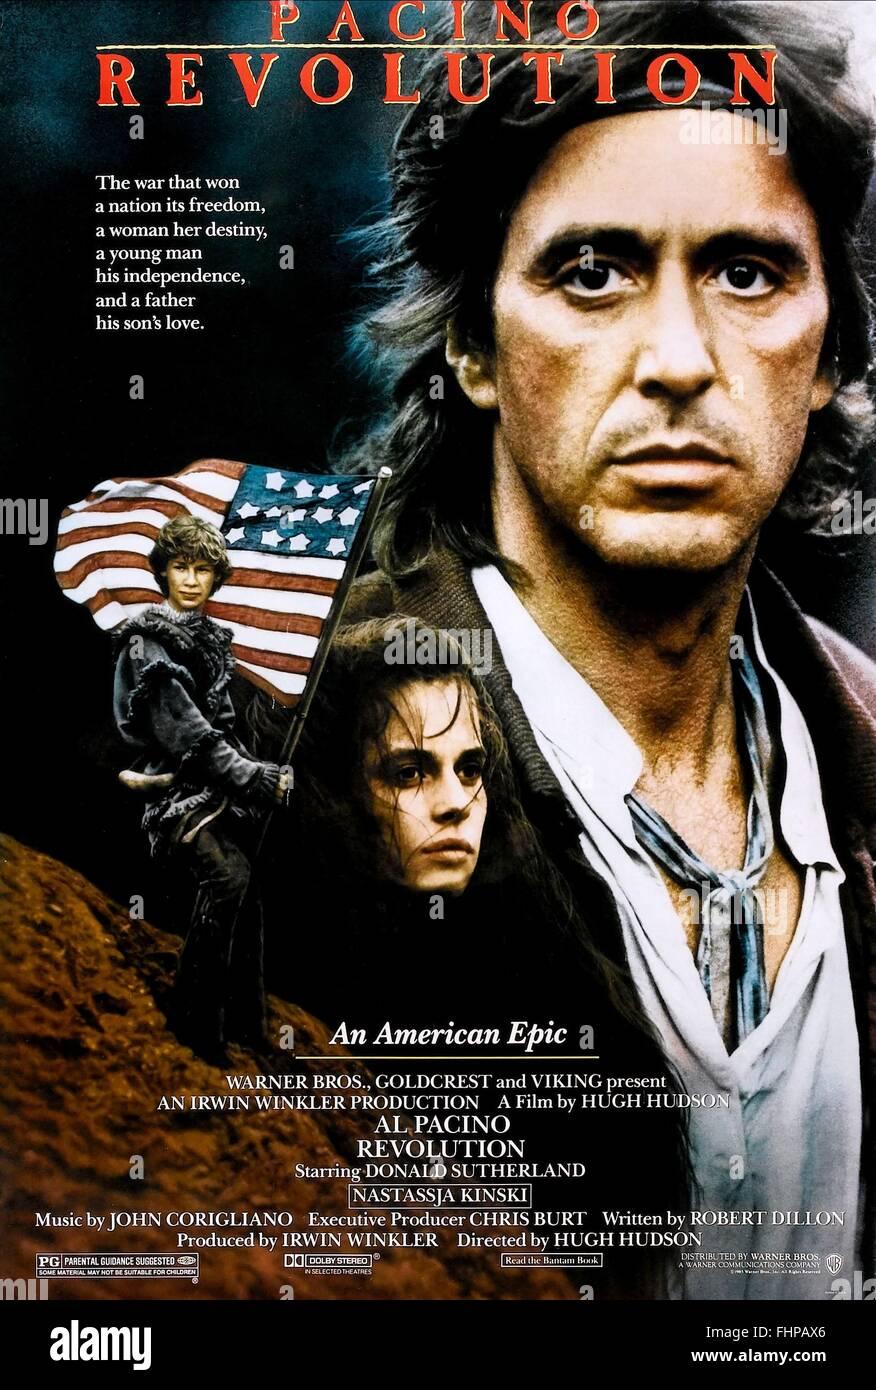 AL PACINO REVOLUTION (1985) Stockbild